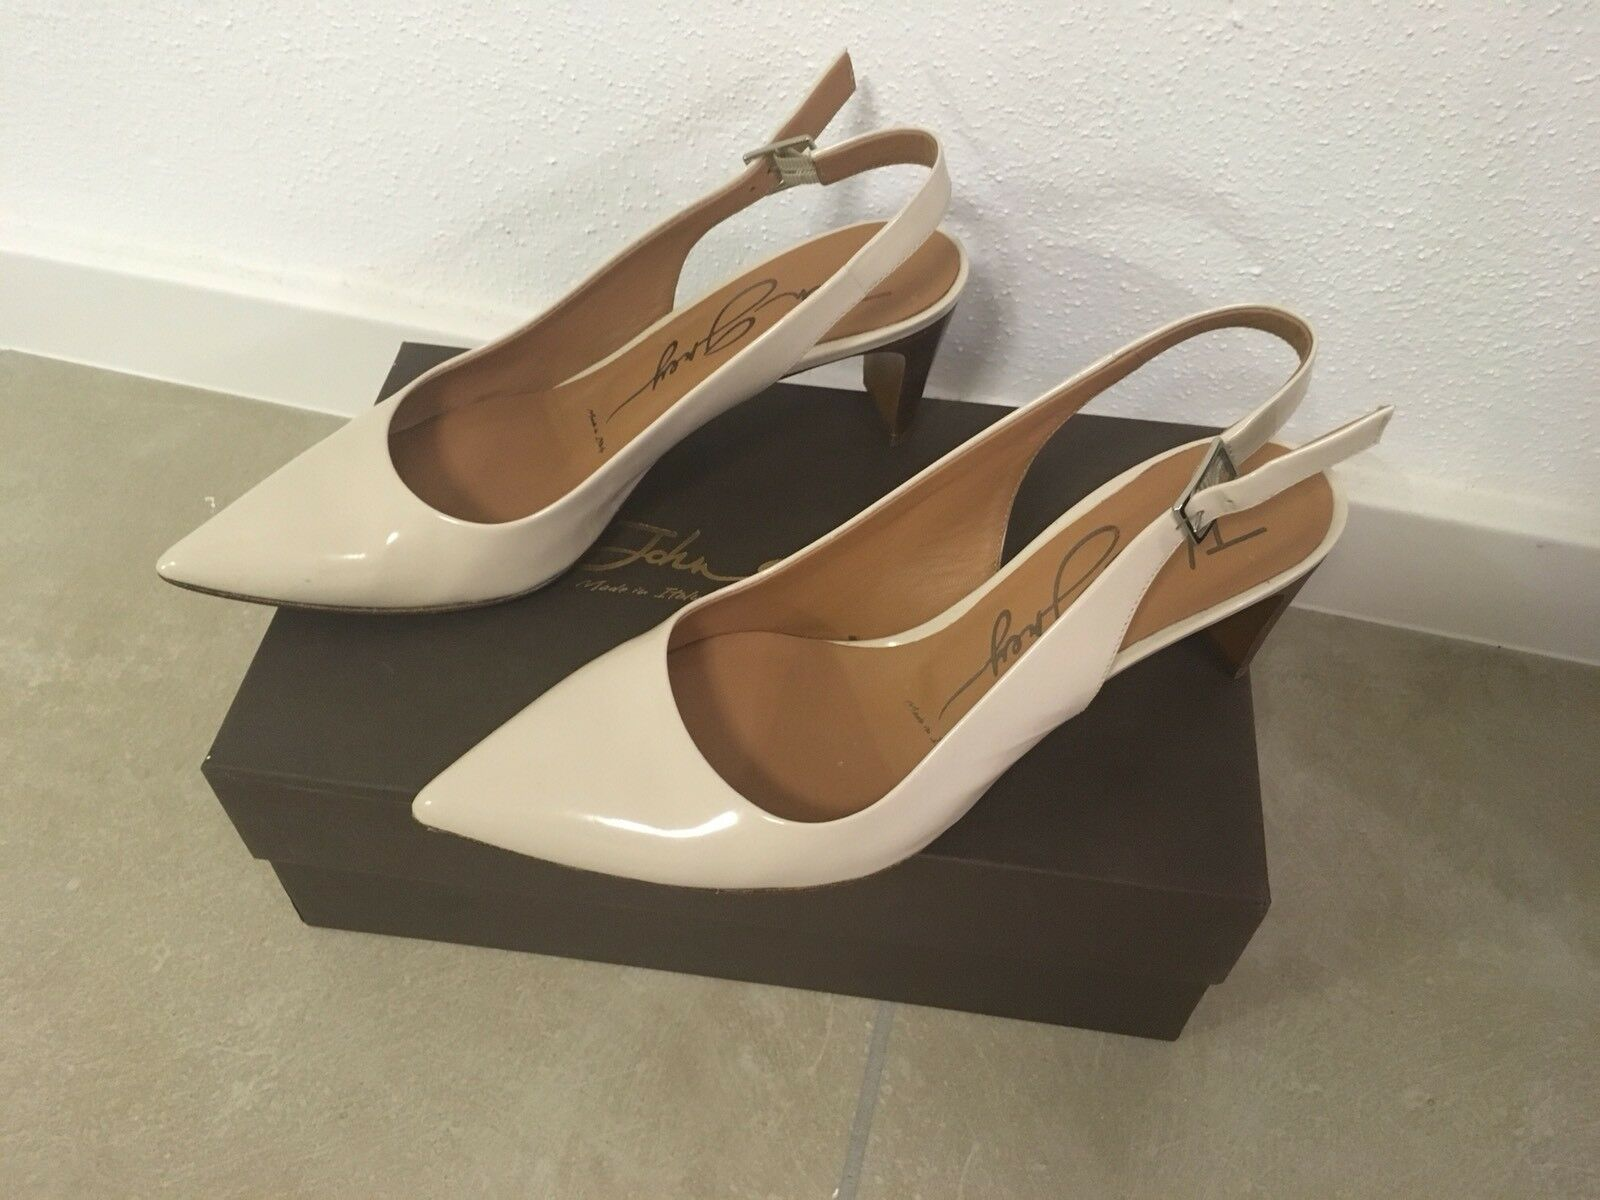 John Grau  Leder Schuhe Schuhe Schuhe Damen Nude Gr. 37,5 Flex Memory Carbon Soft f51e19